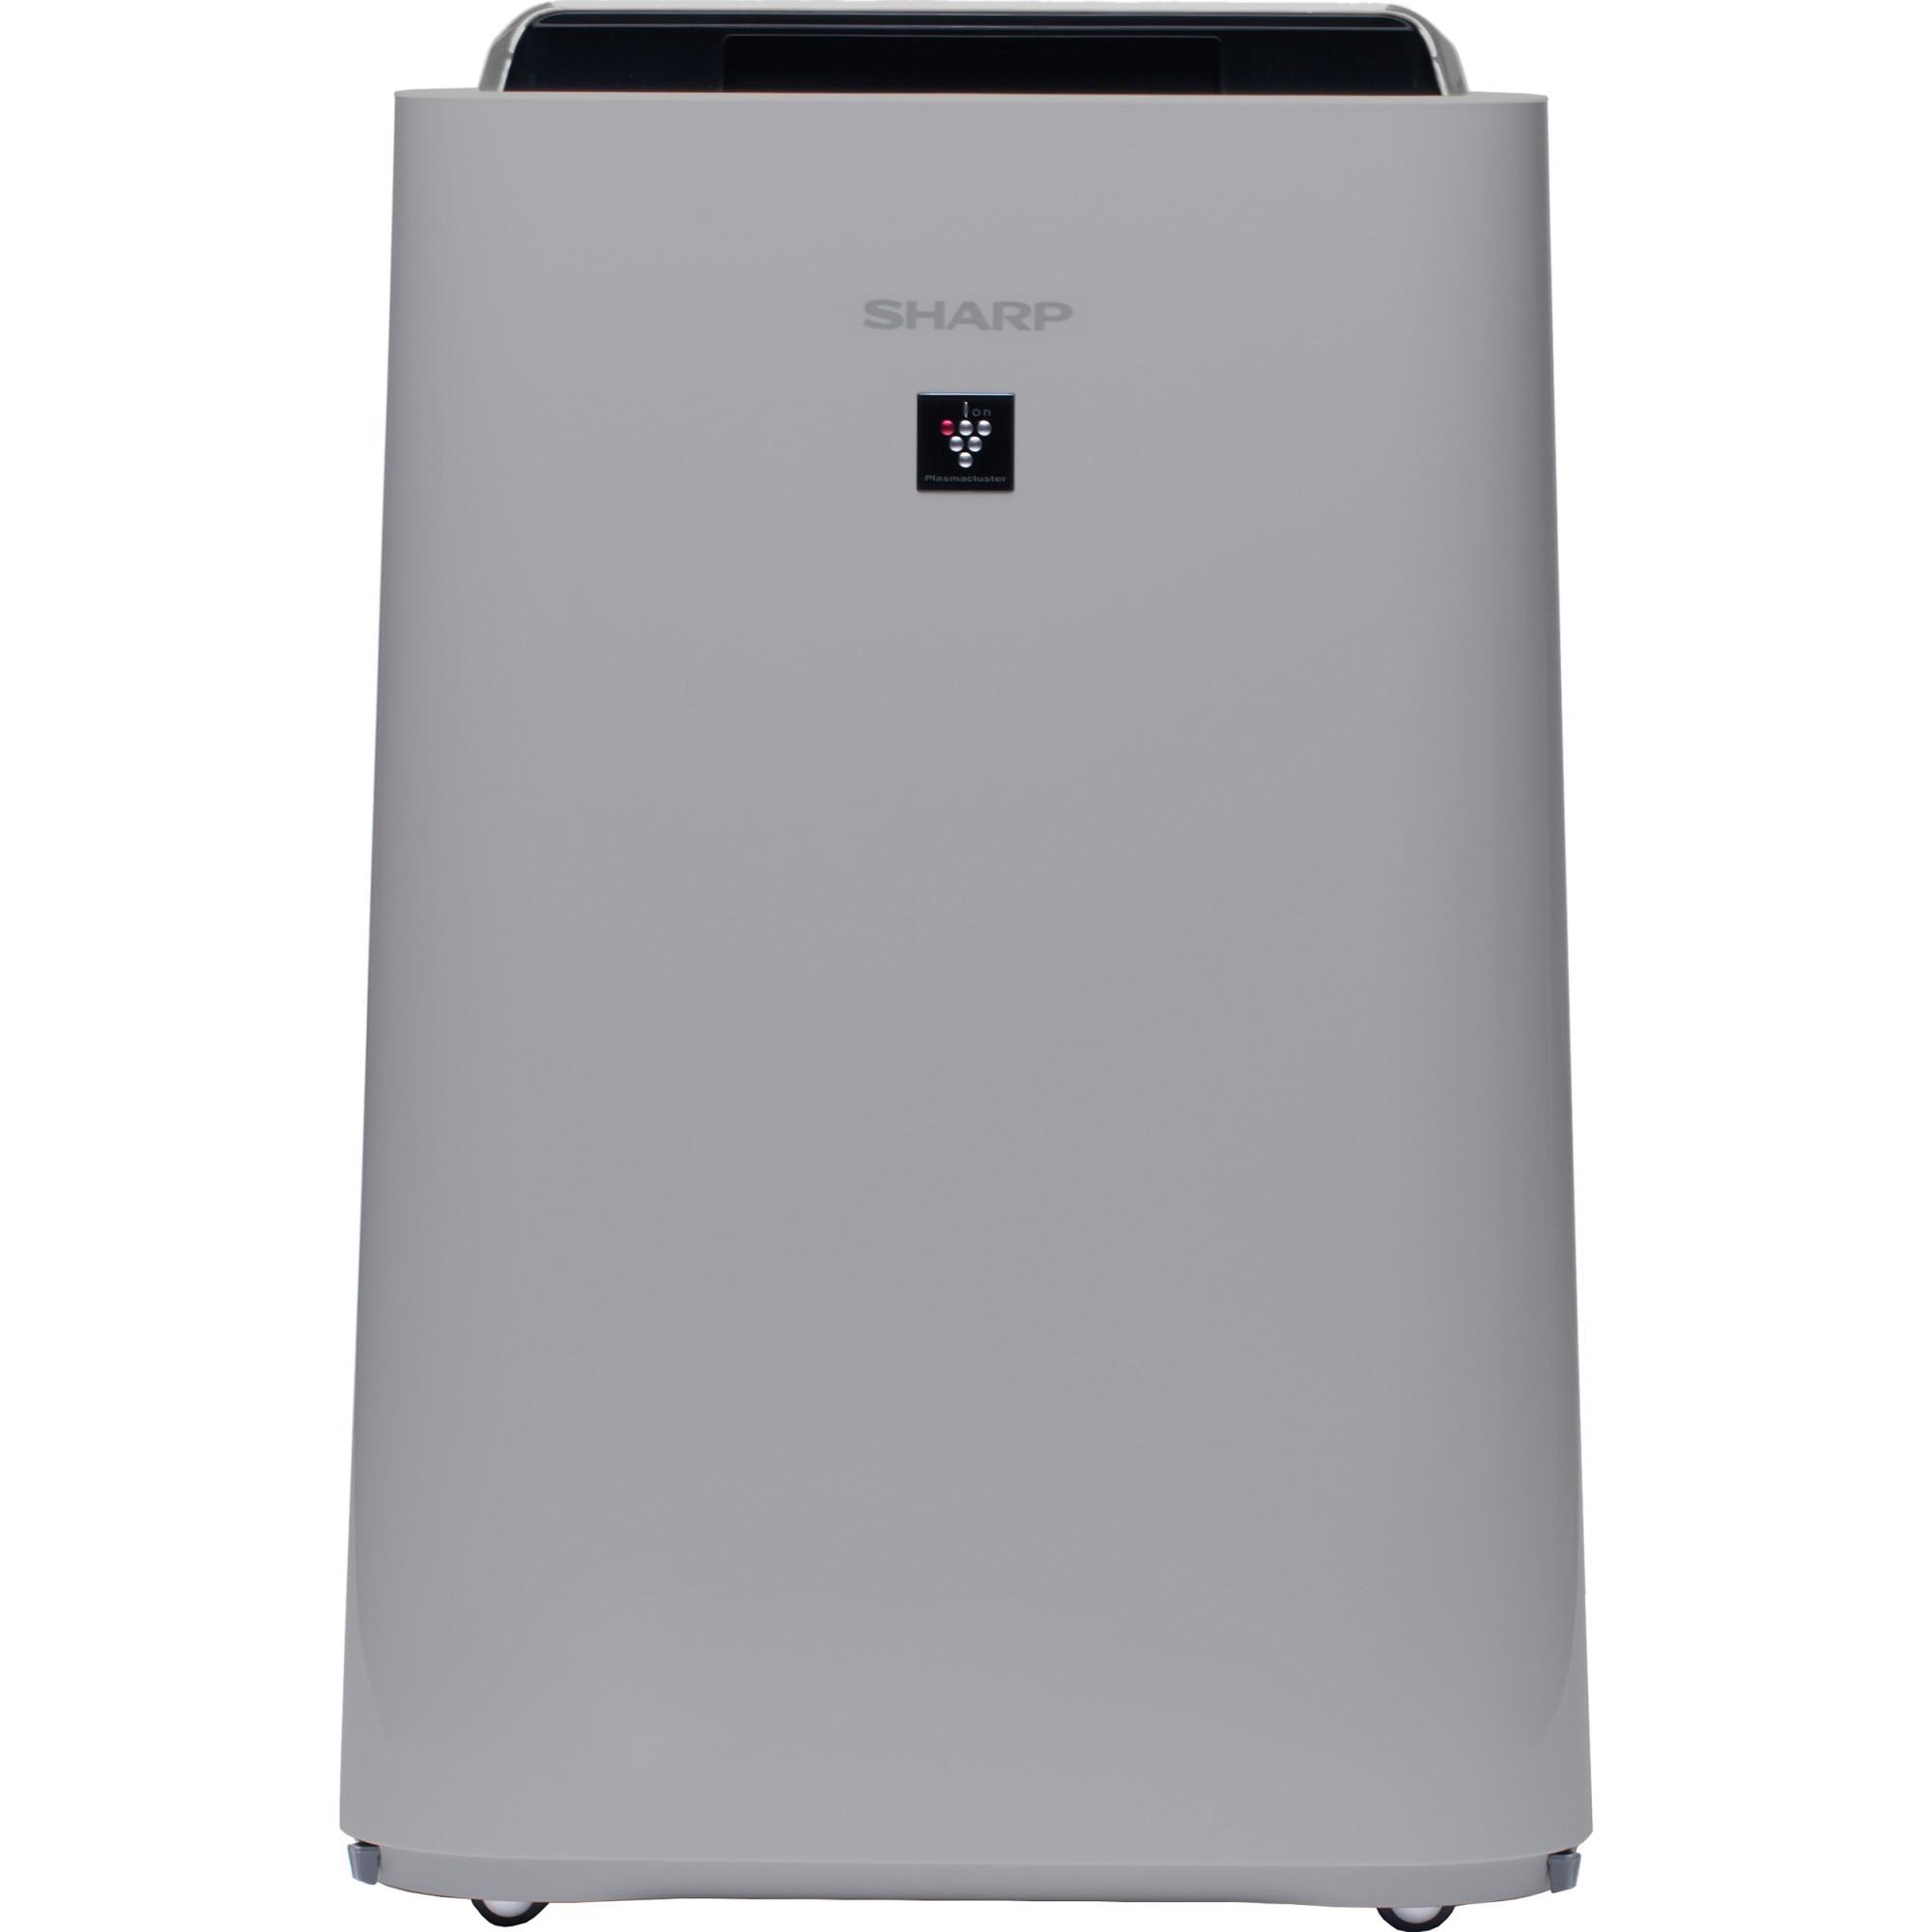 Fotografie Purificator de aer cu umidificator Sharp UA-HD60E-L, 4 modele de filtrare, 4 senzori de praf, Plasmacluster Ion Technology, 48m², alb